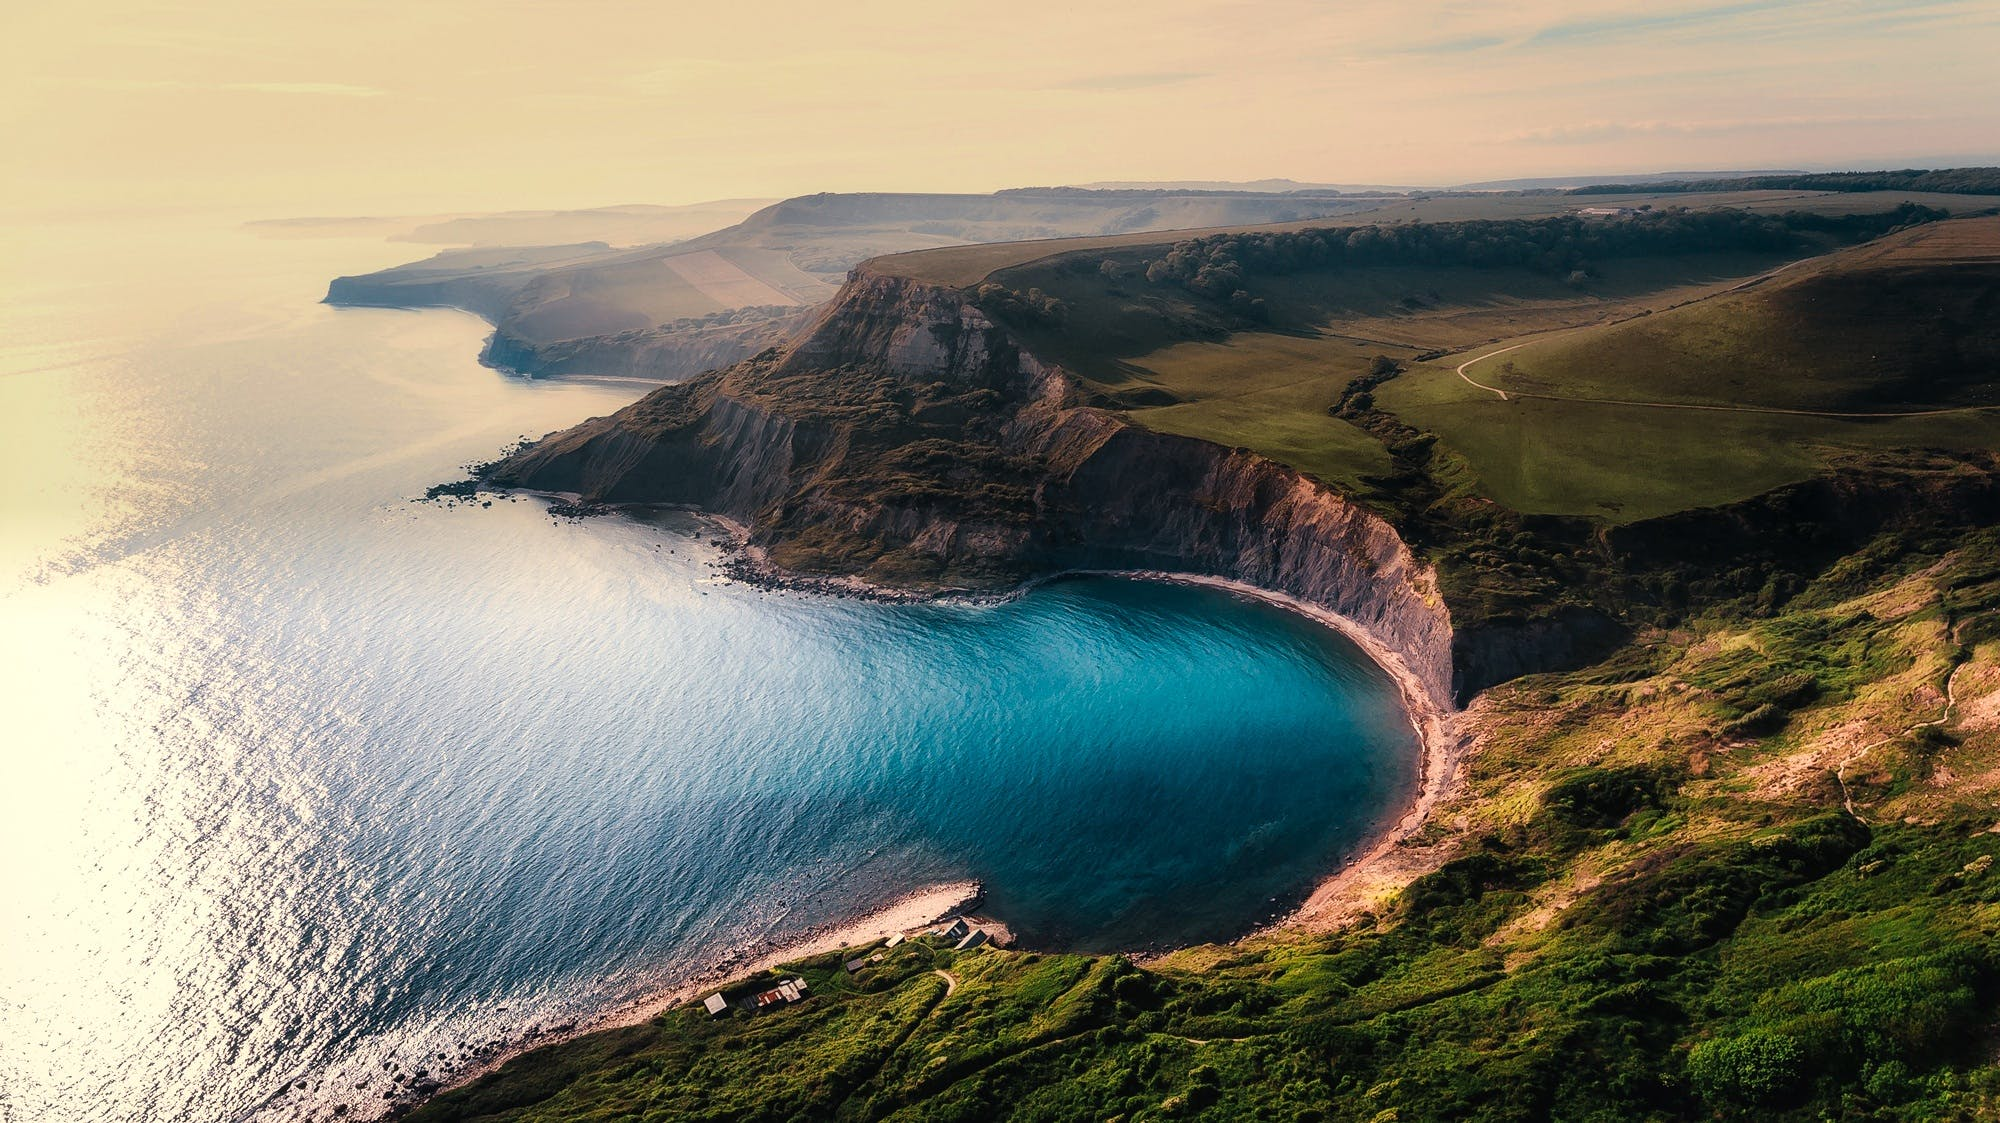 Fotobanka sbezplatnými fotkami na tému hory, krajina, krajina pri mori, krásny